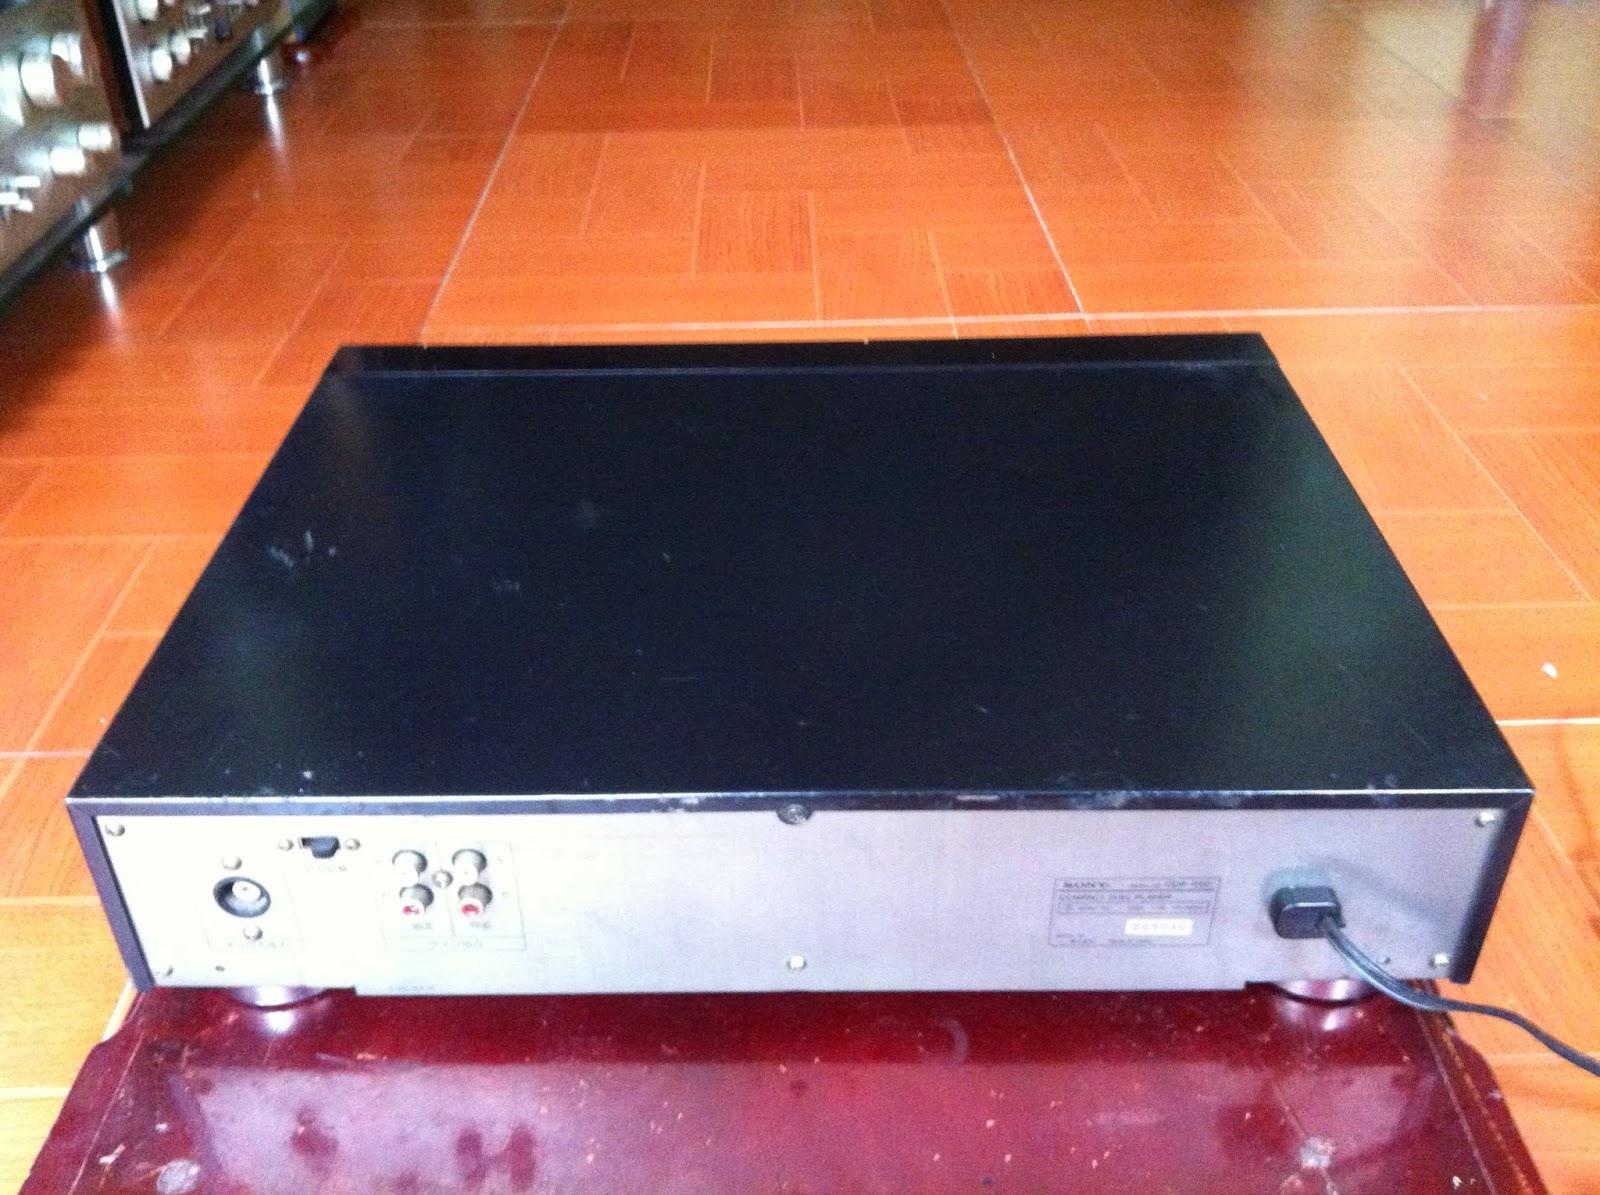 Mặt sau CDP-950